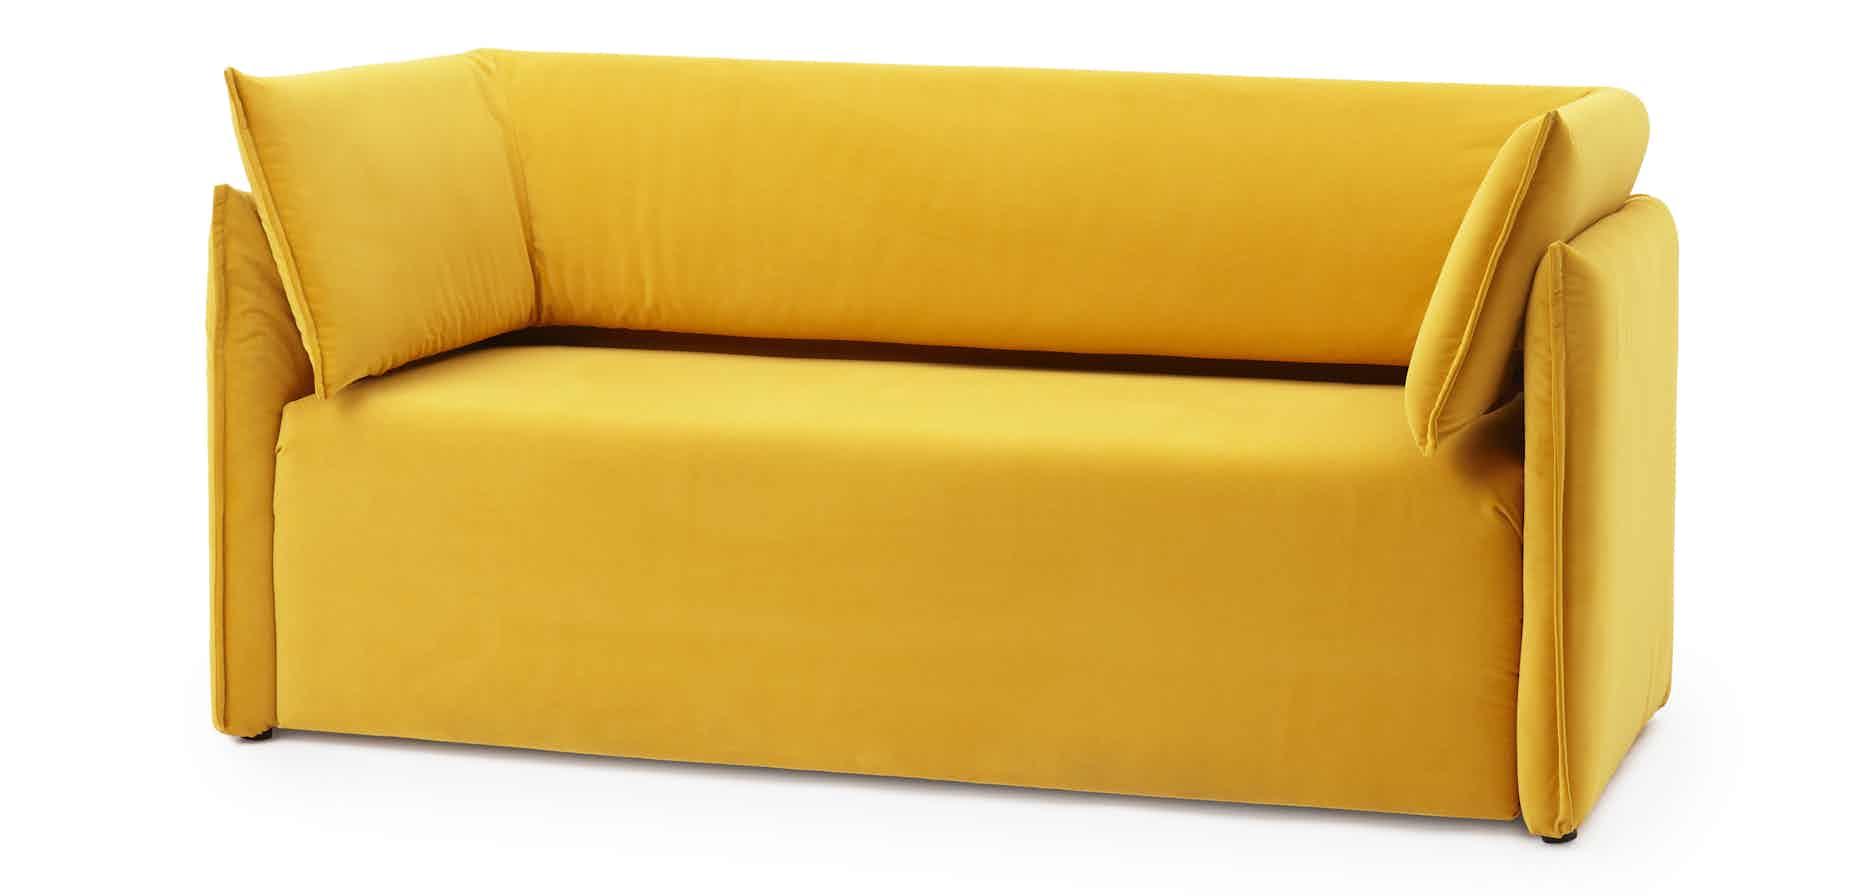 Articles-furniture-yellow-boxlike-sofa-haute-living